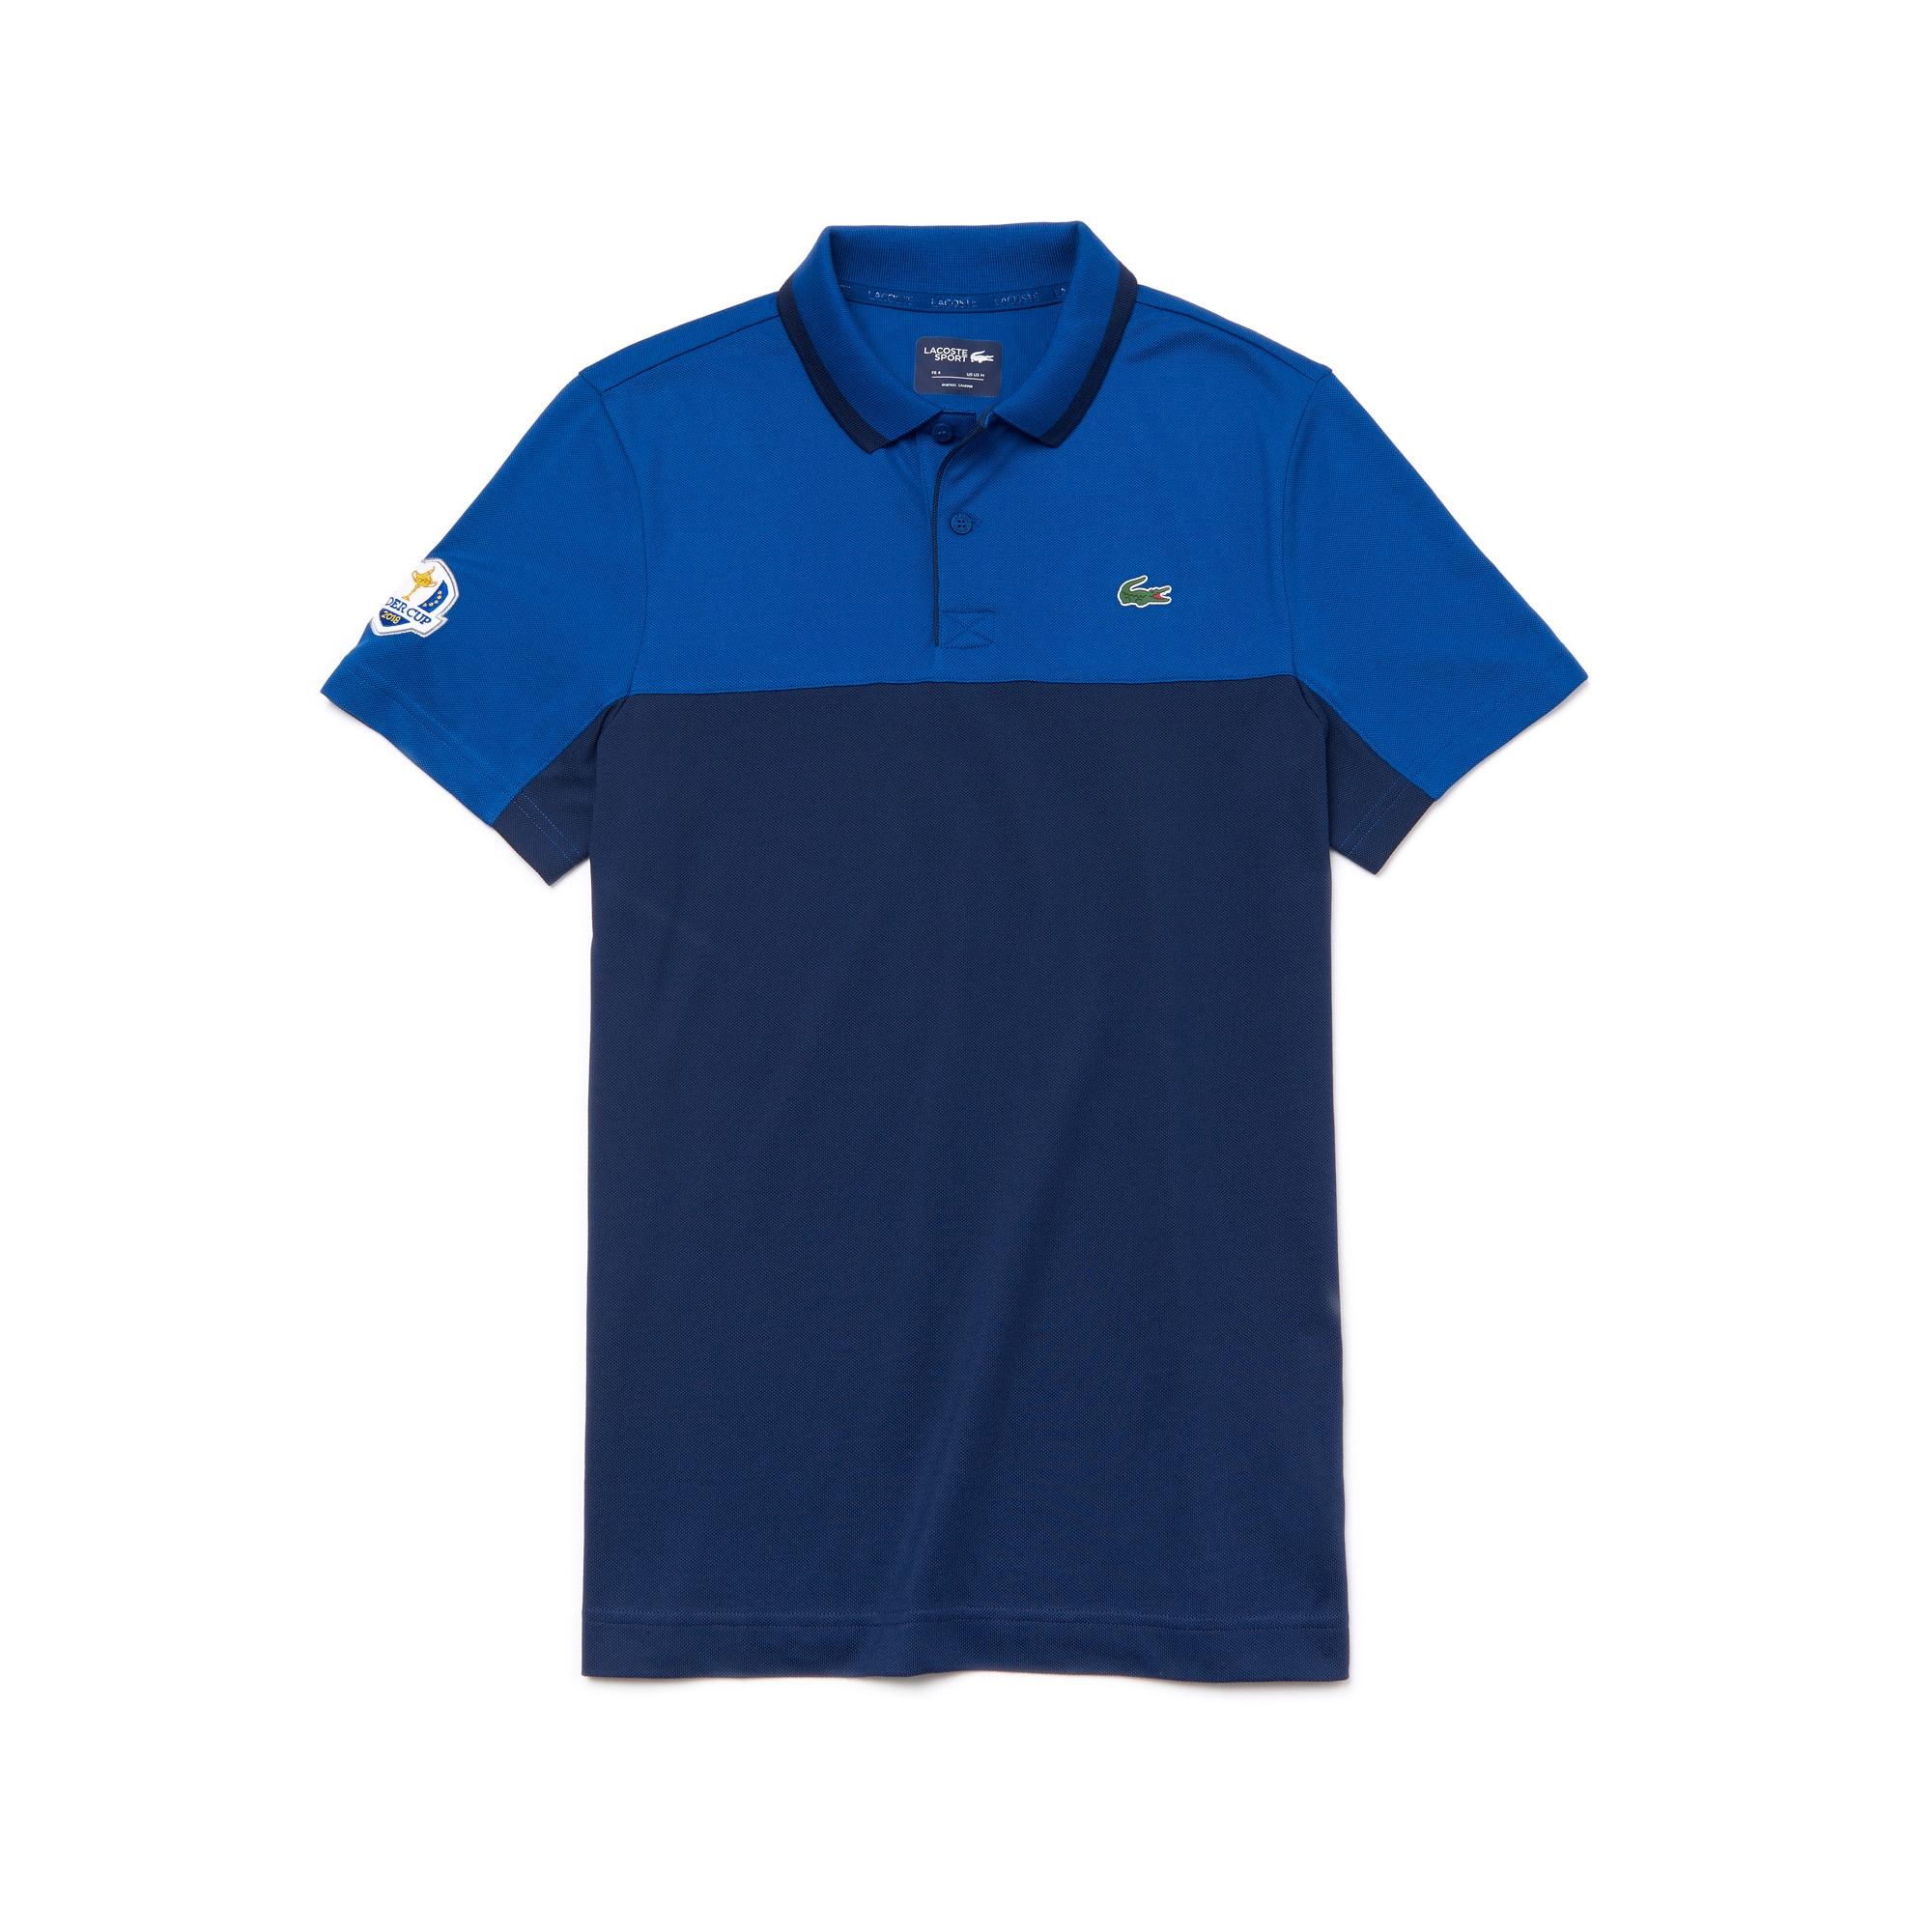 Men's  SPORT Ryder Cup Edition Tech Petit Piqué Golf Polo Shirt